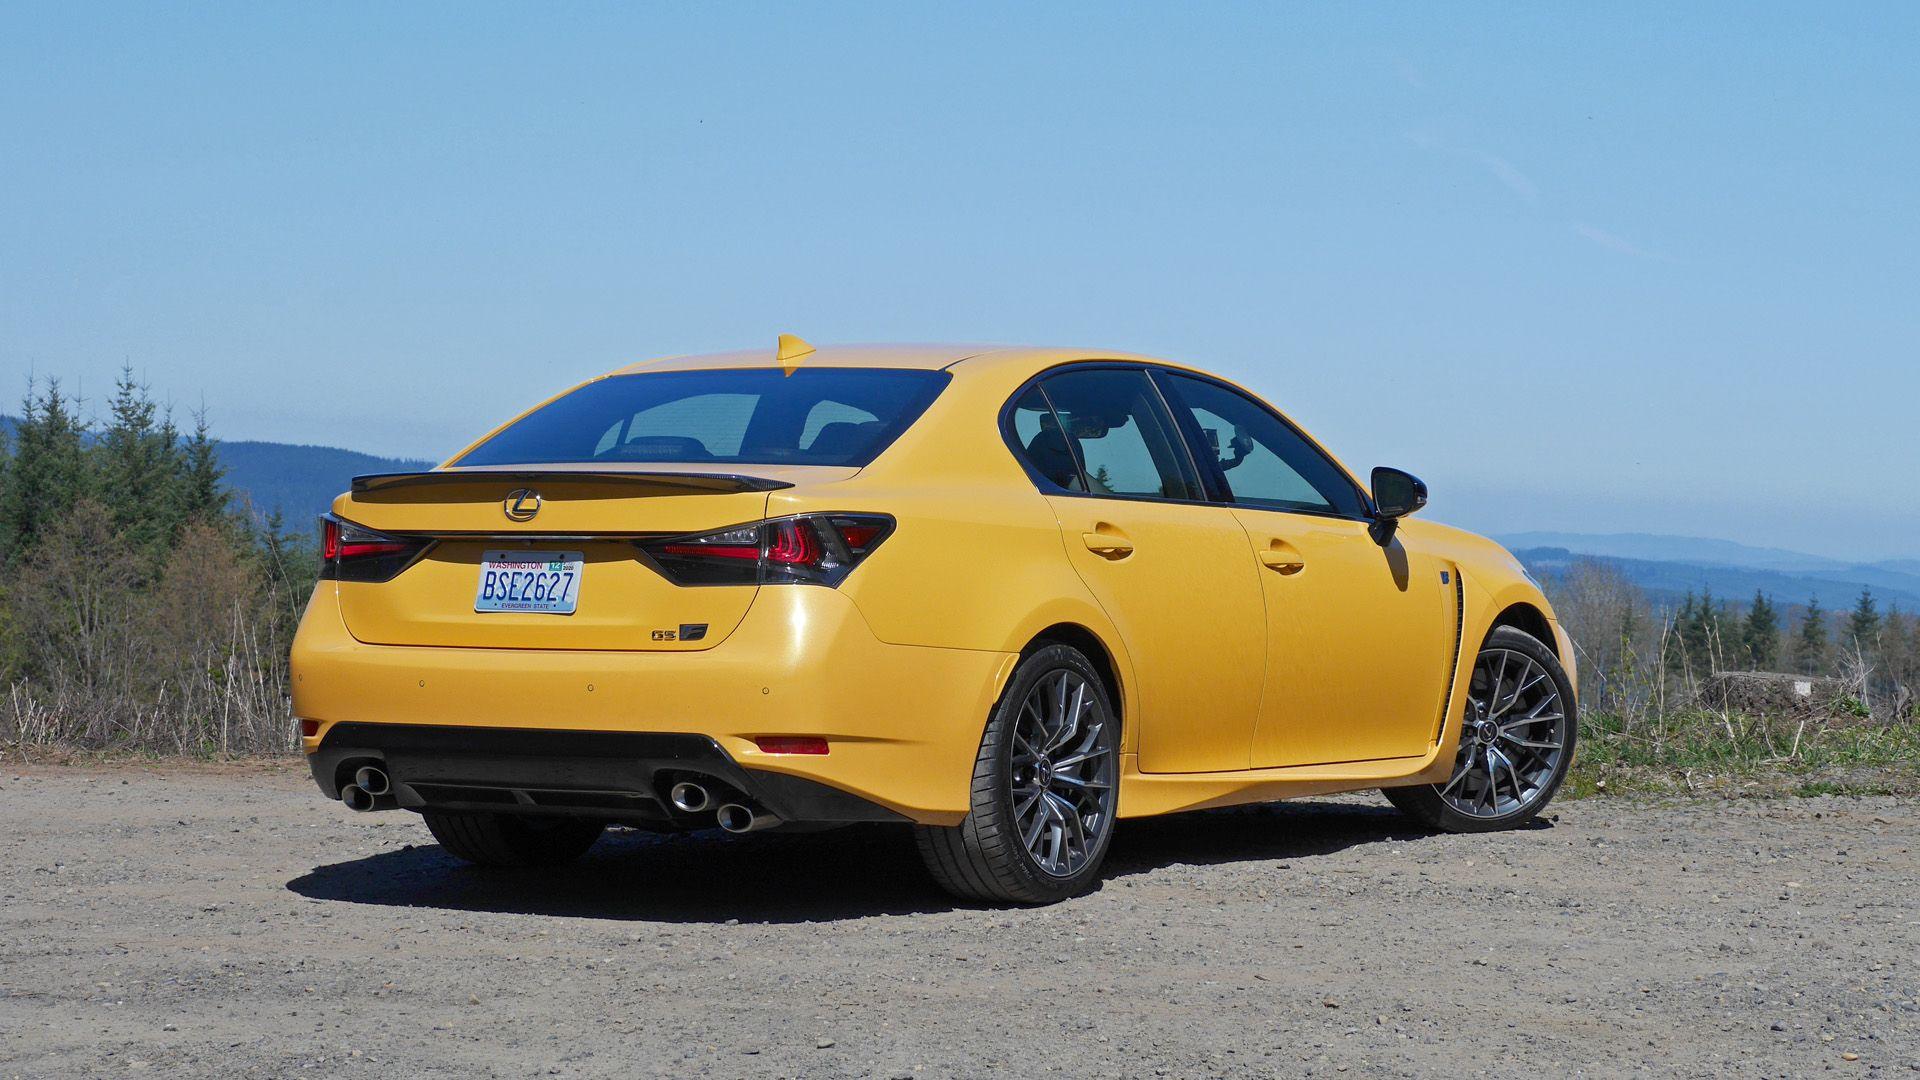 2020 Lexus Gs F Review Performance 0 60 Exhaust Noise Video In 2020 Lexus Performance Reviews